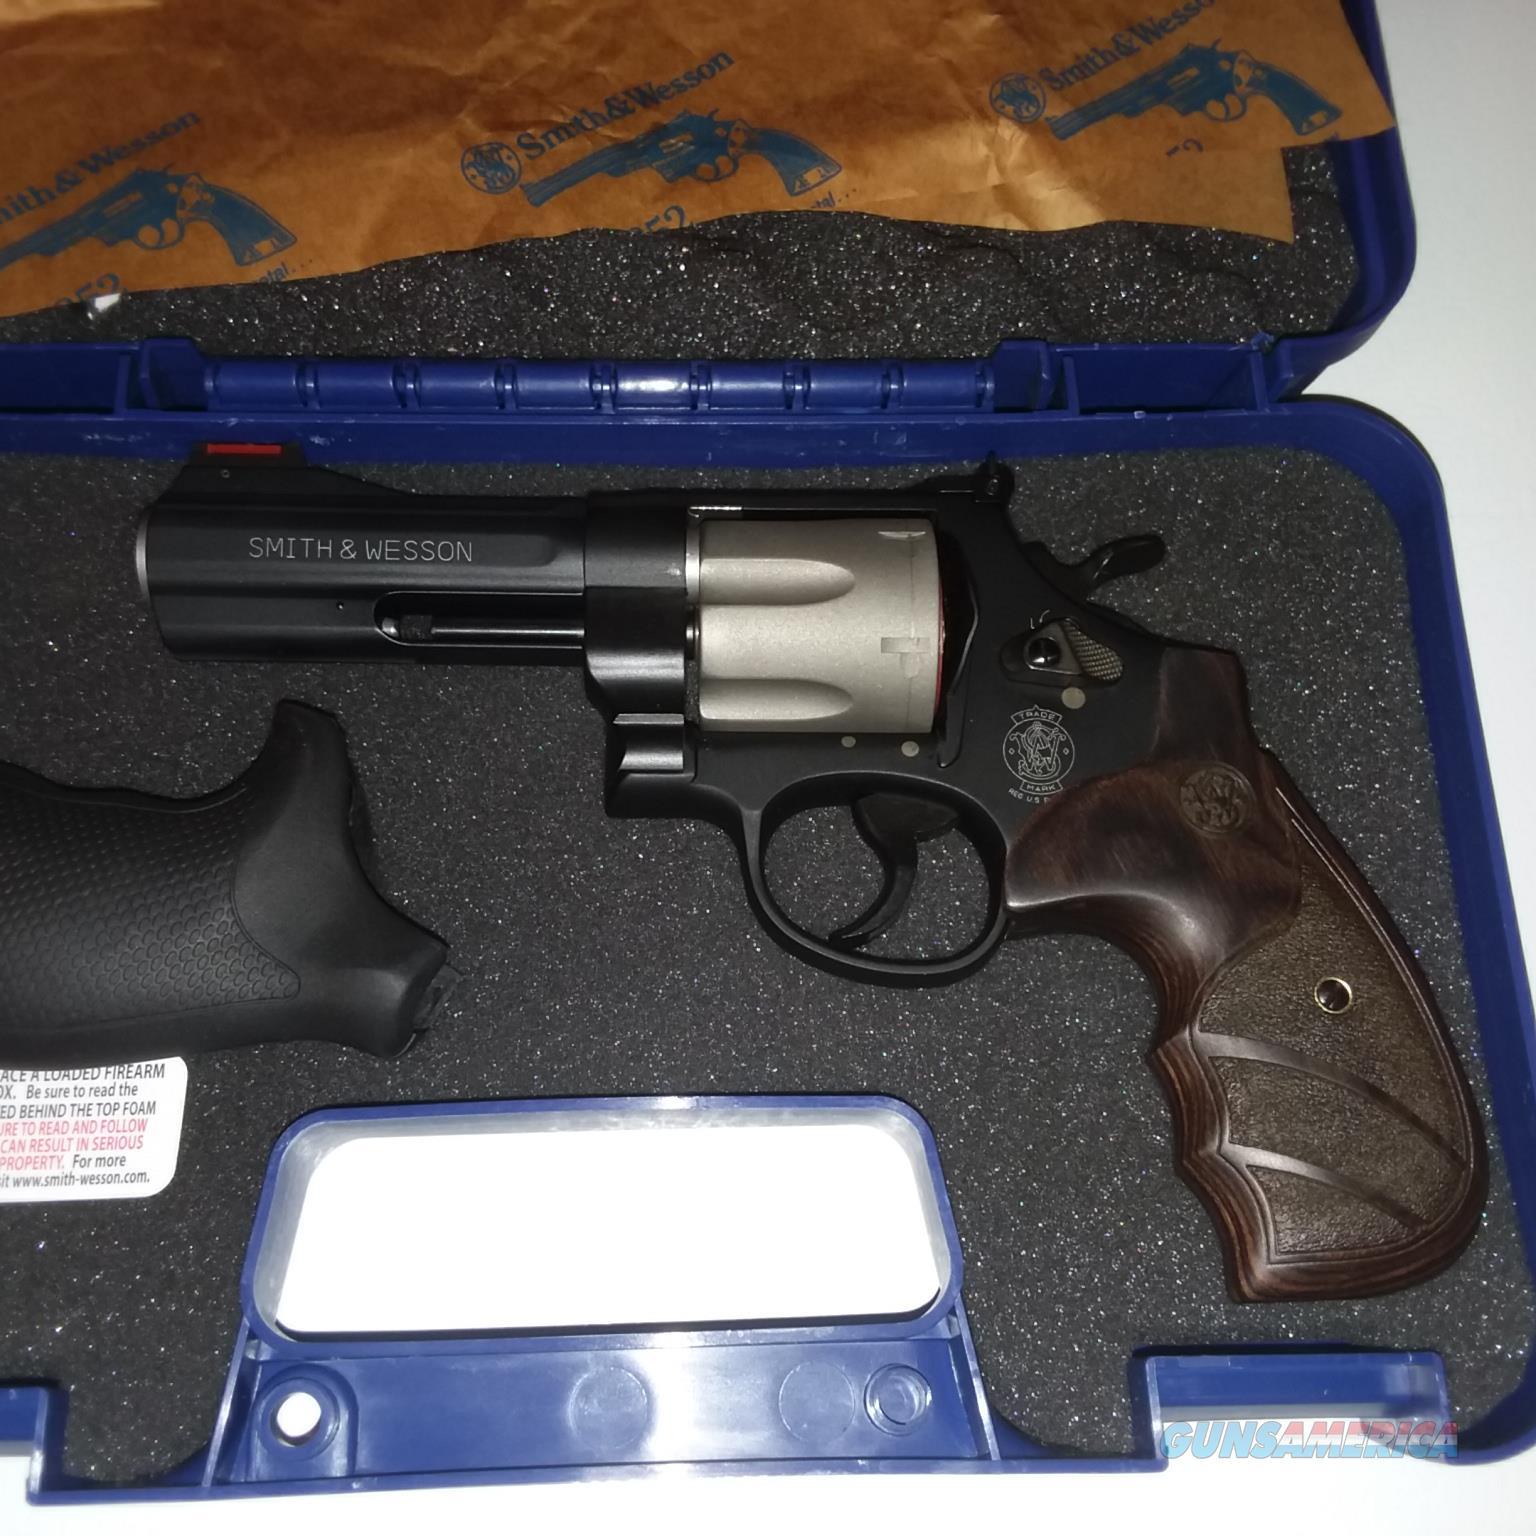 Smith & Wesson 329PD .44 Magnum NIB  Guns > Pistols > Smith & Wesson Revolvers > Med. Frame ( K/L )